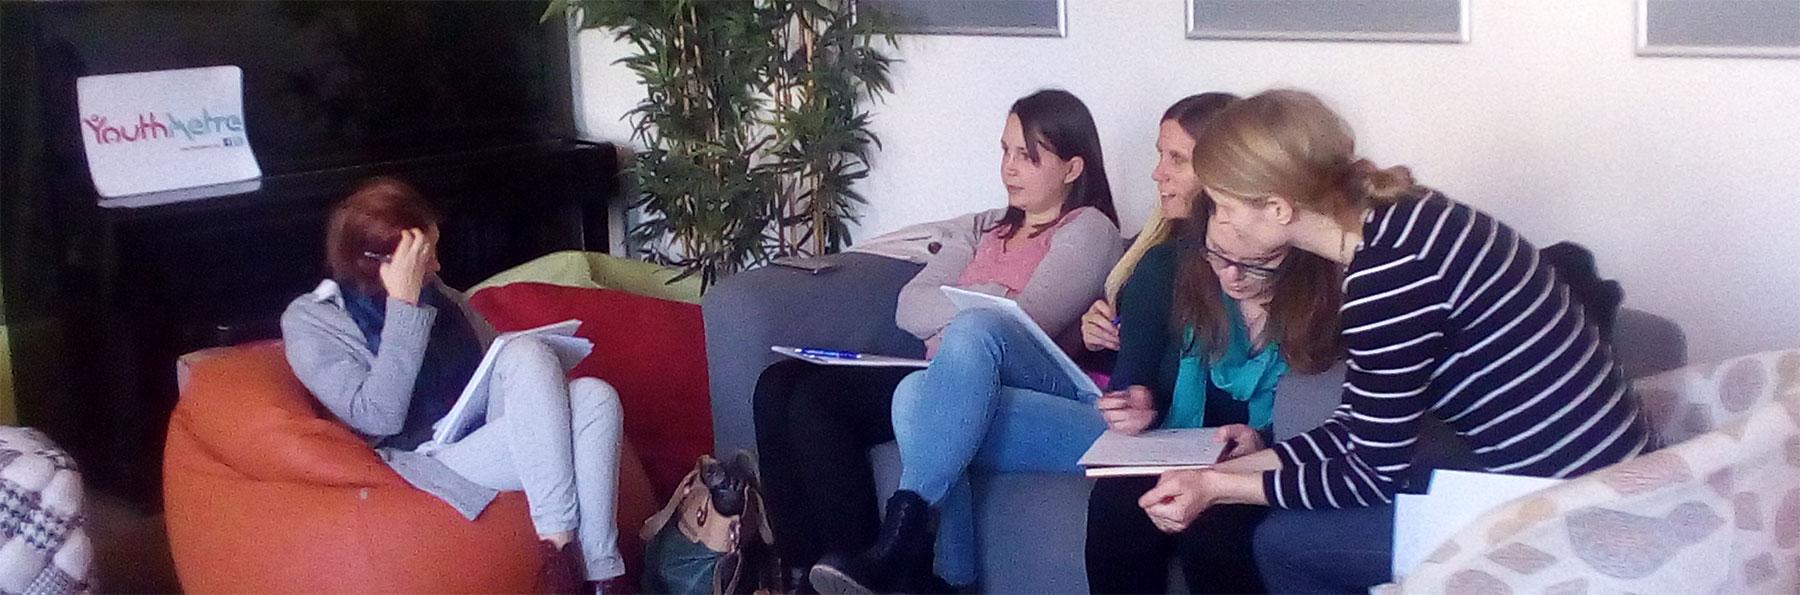 YouthMetre Study Group Ljublijana